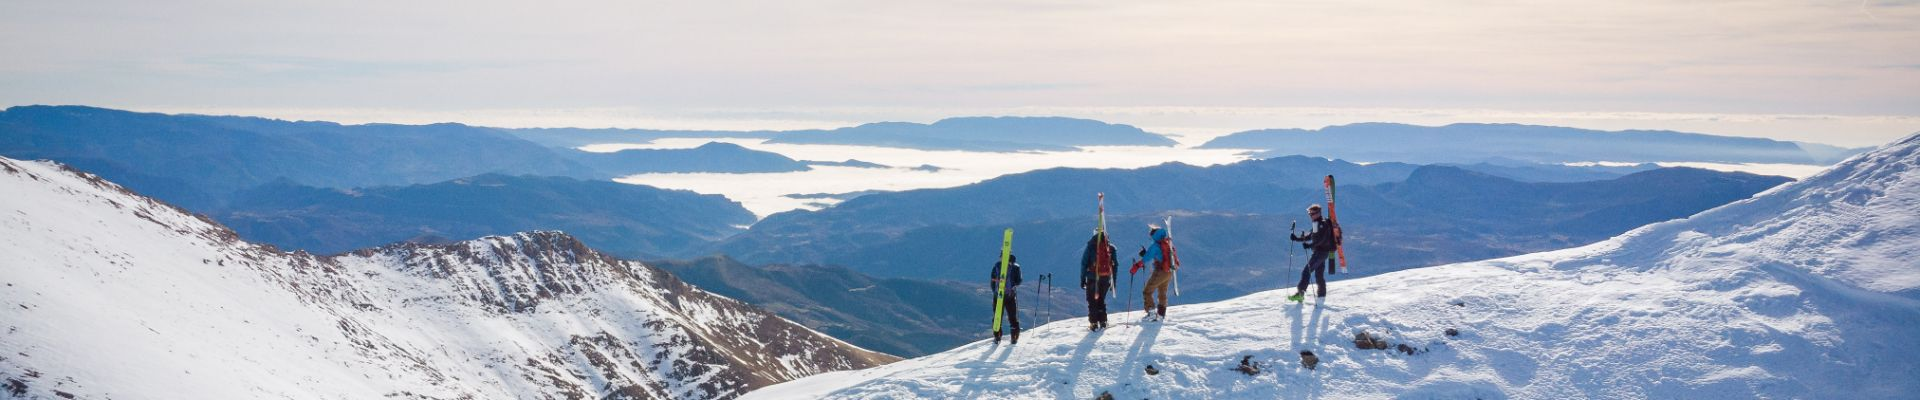 ski-touring-pirineo-baqueira-1